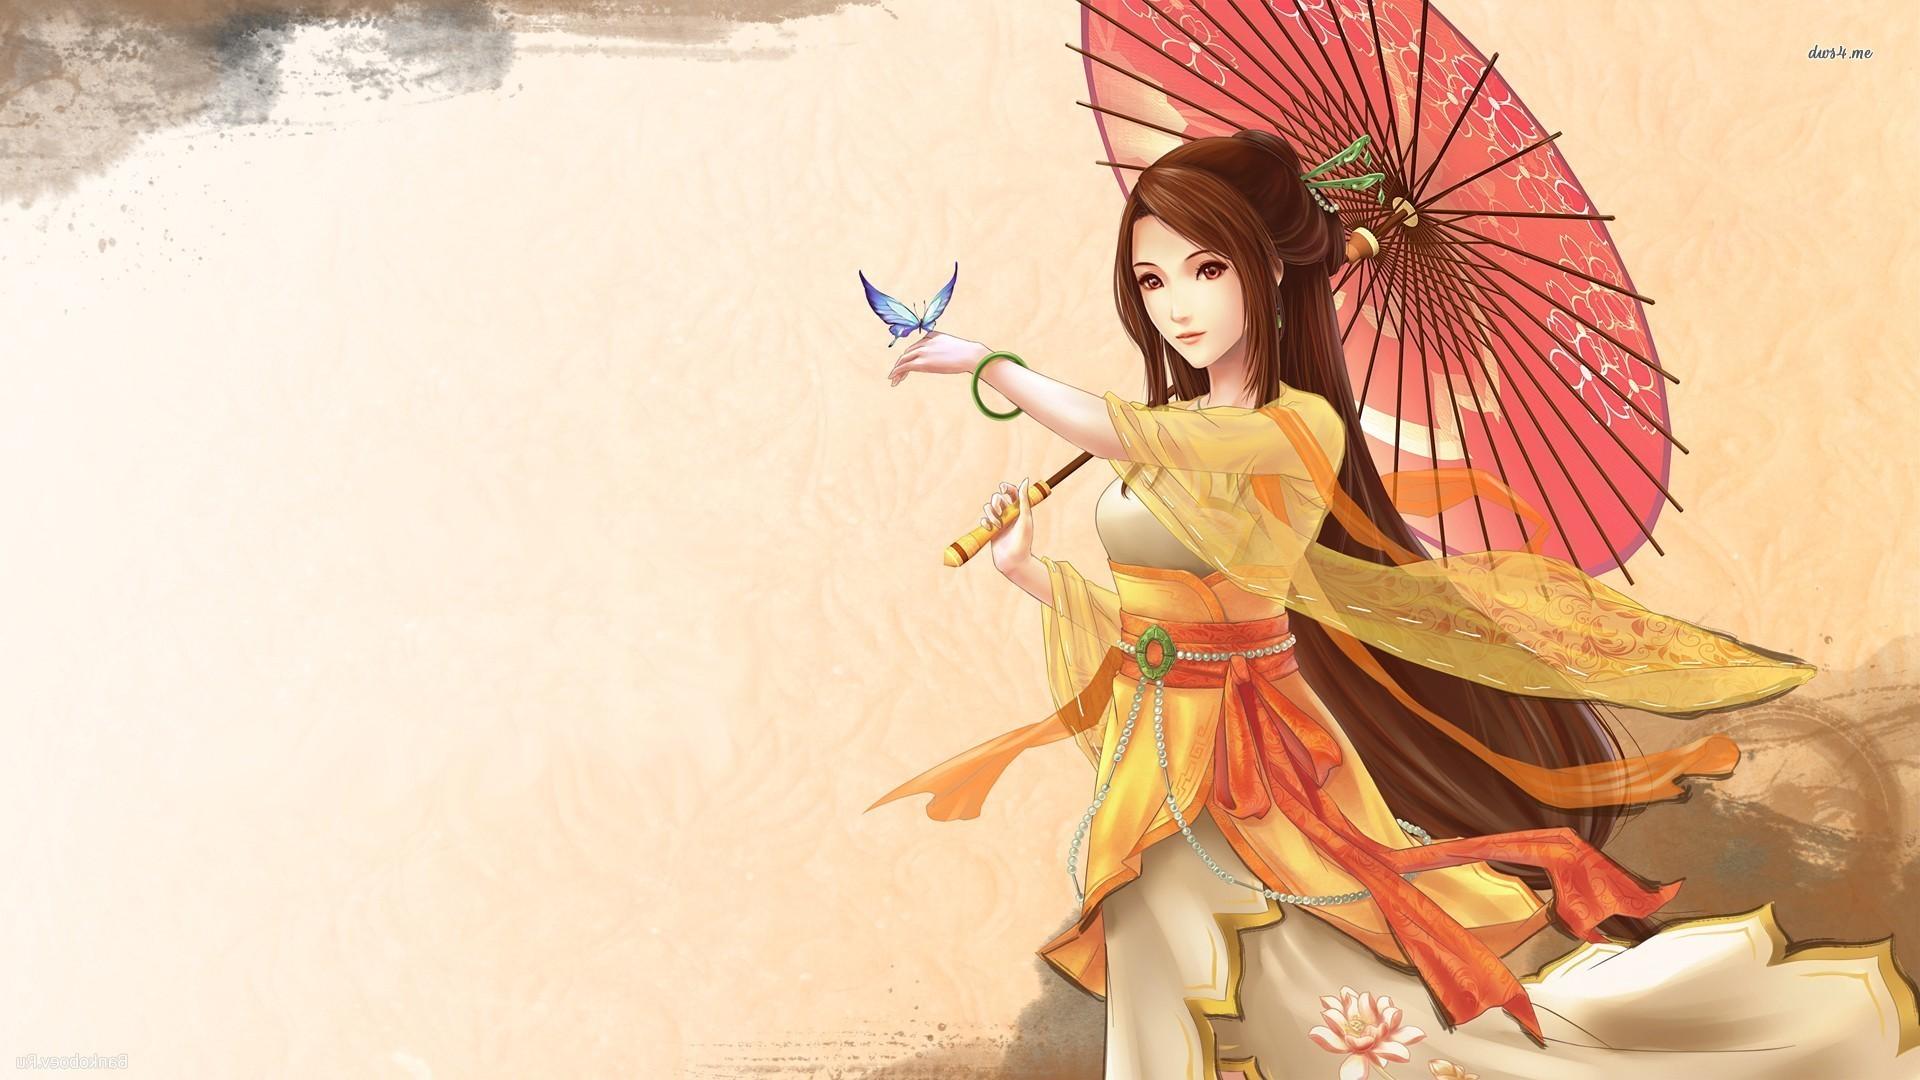 Res: 1920x1080, ... Girl in a kimono wallpaper  ...